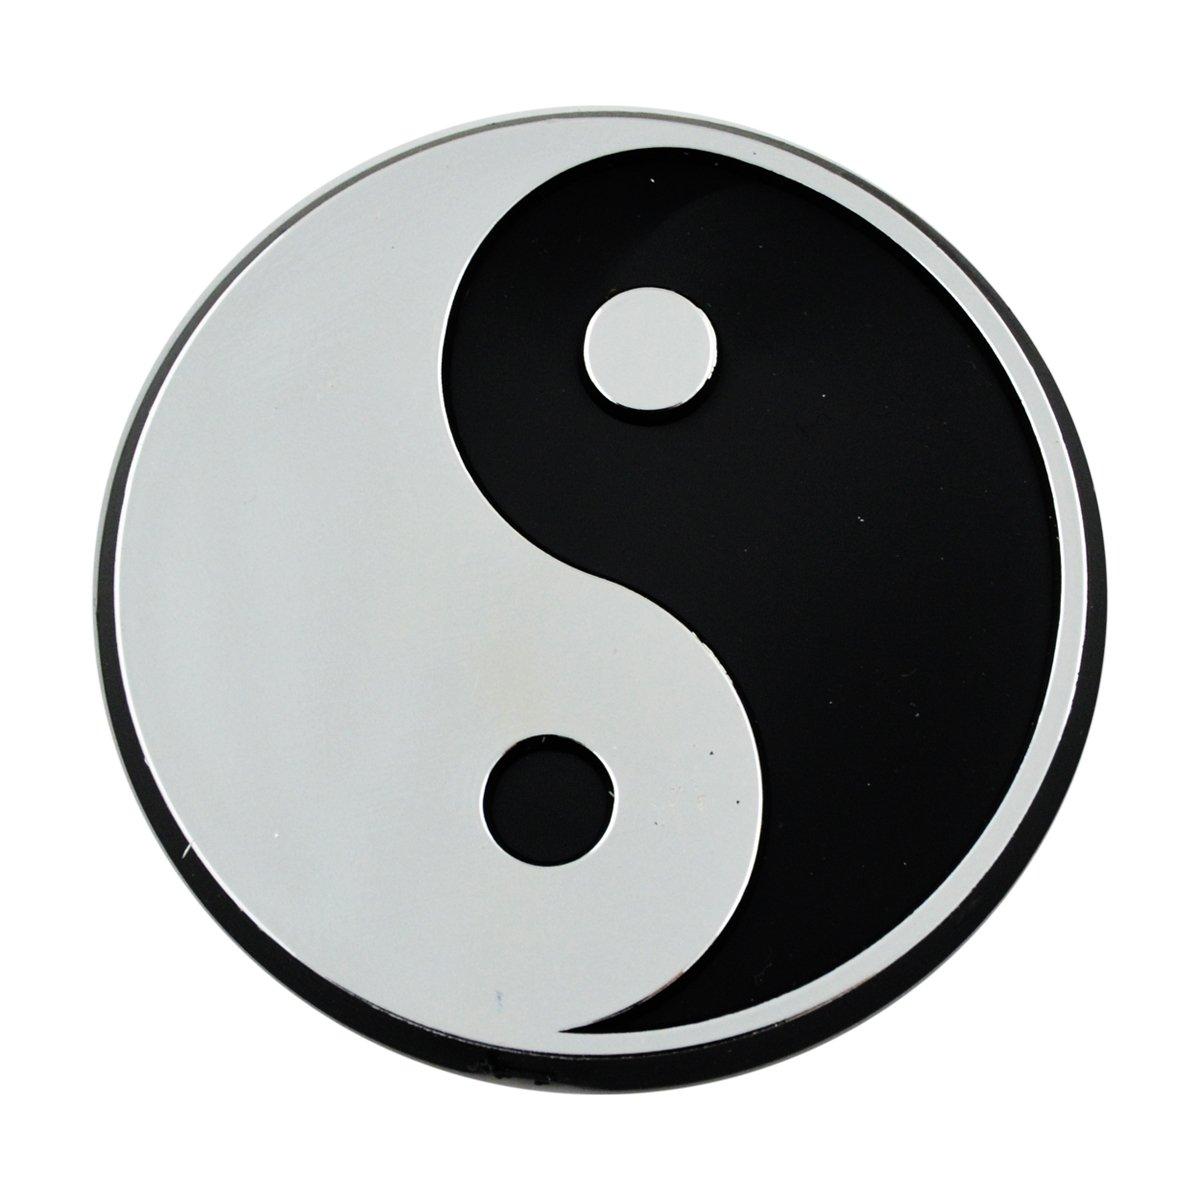 Yin Yang Peace Chrome Auto Emblem 2.5 x 2.5 EvolveFISH EF-EMB-P-00051